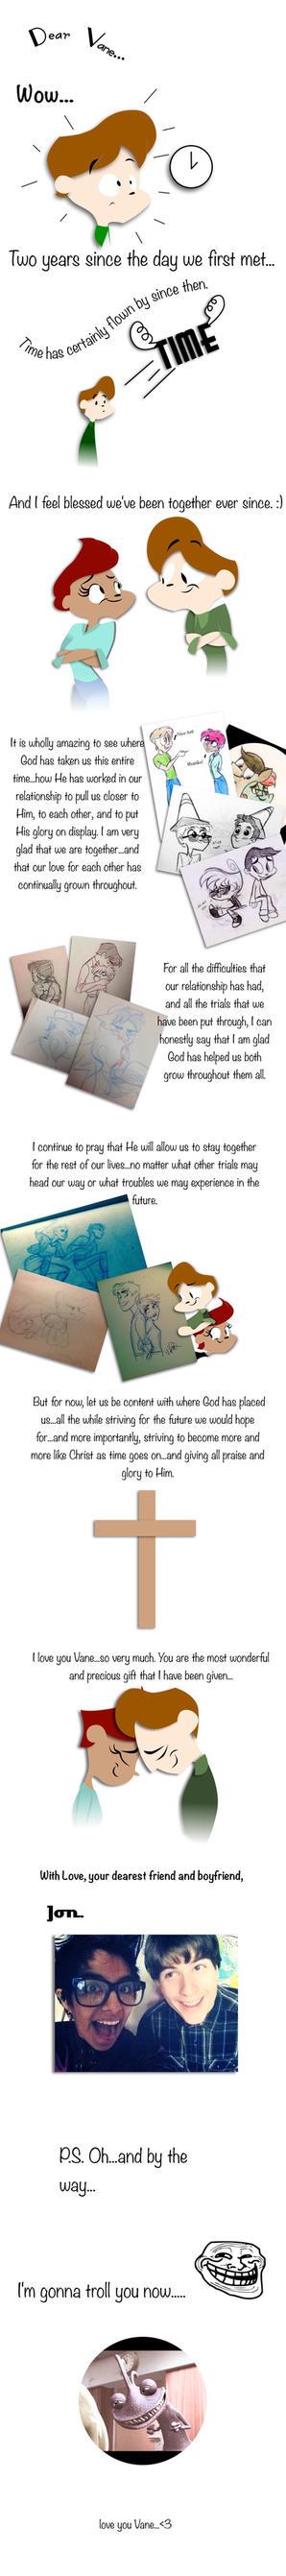 Dear Vane: 2nd Anniv Comic. by Jon-The-Hillbilly